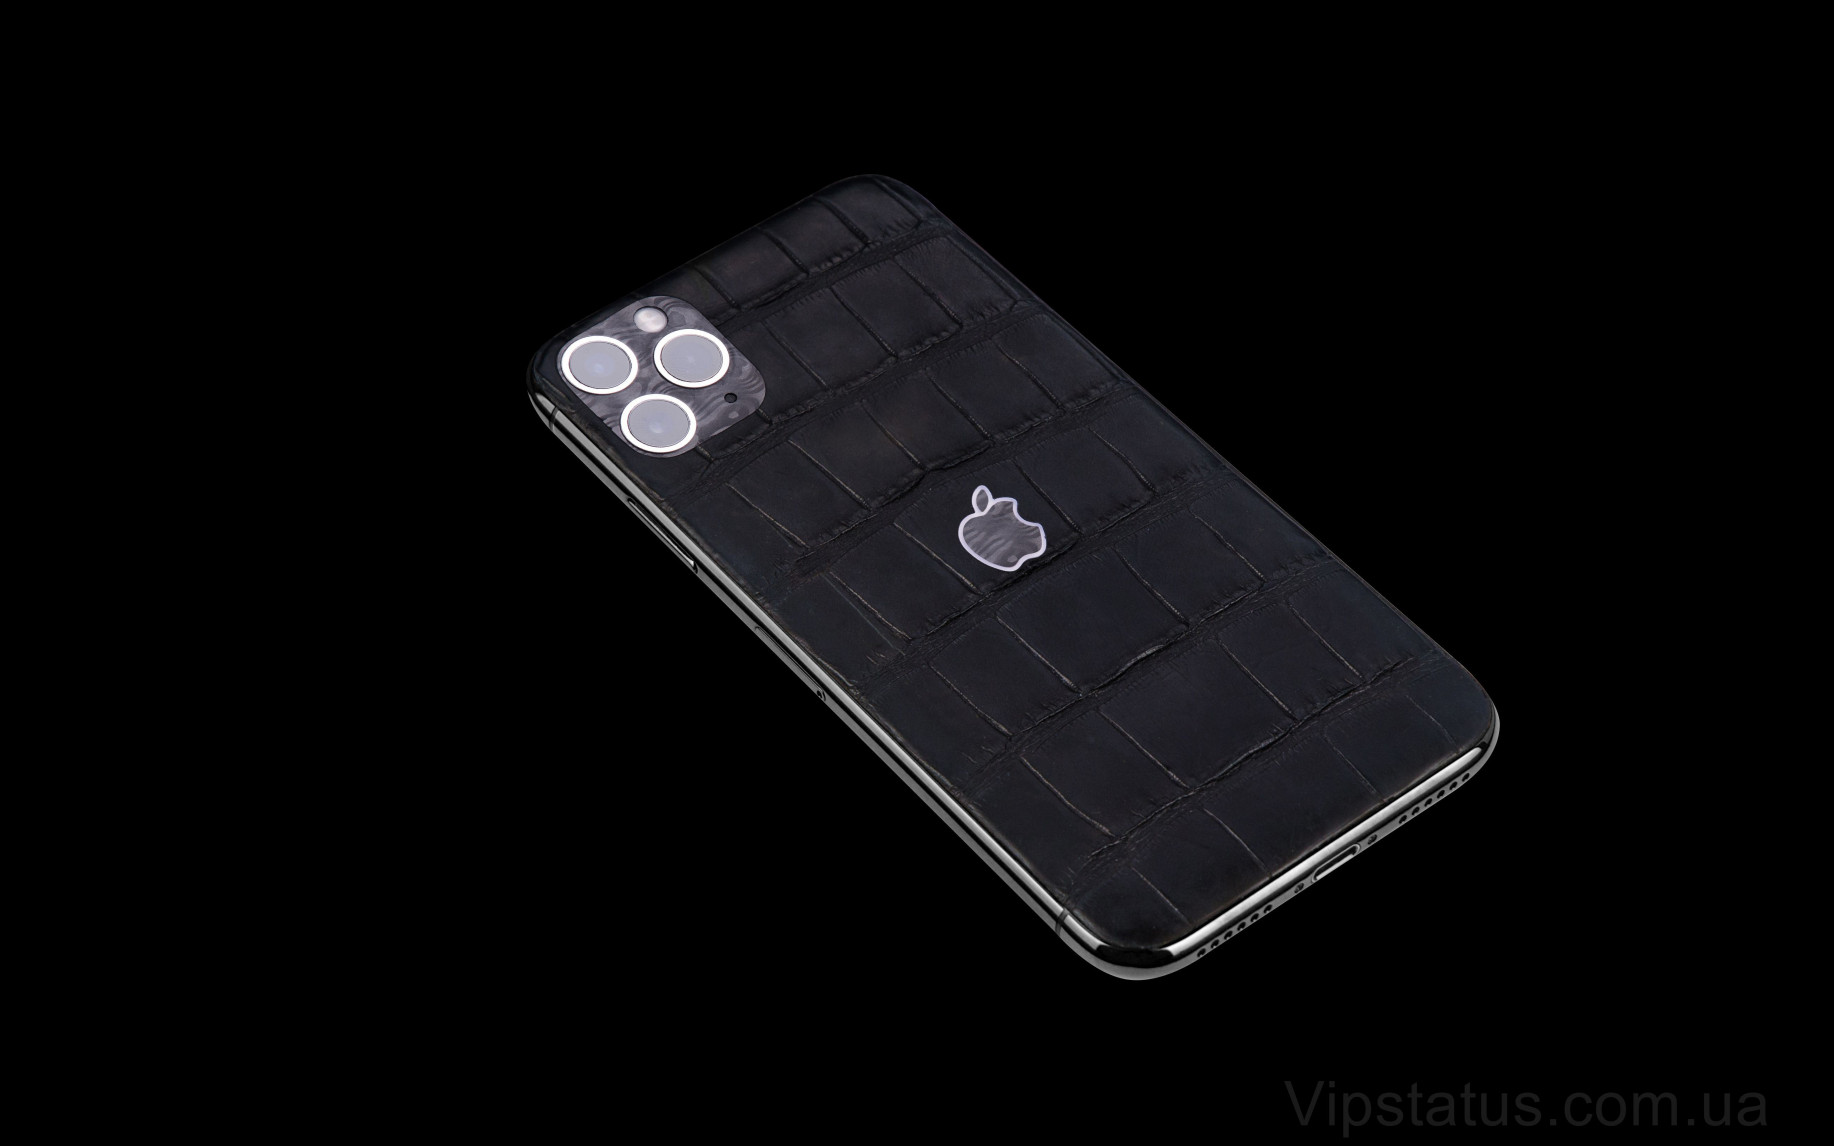 Elite Black Lord Carbon IPHONE 12 PRO MAX 512 GB Black Lord Carbon IPHONE 12 PRO MAX 512 GB image 3